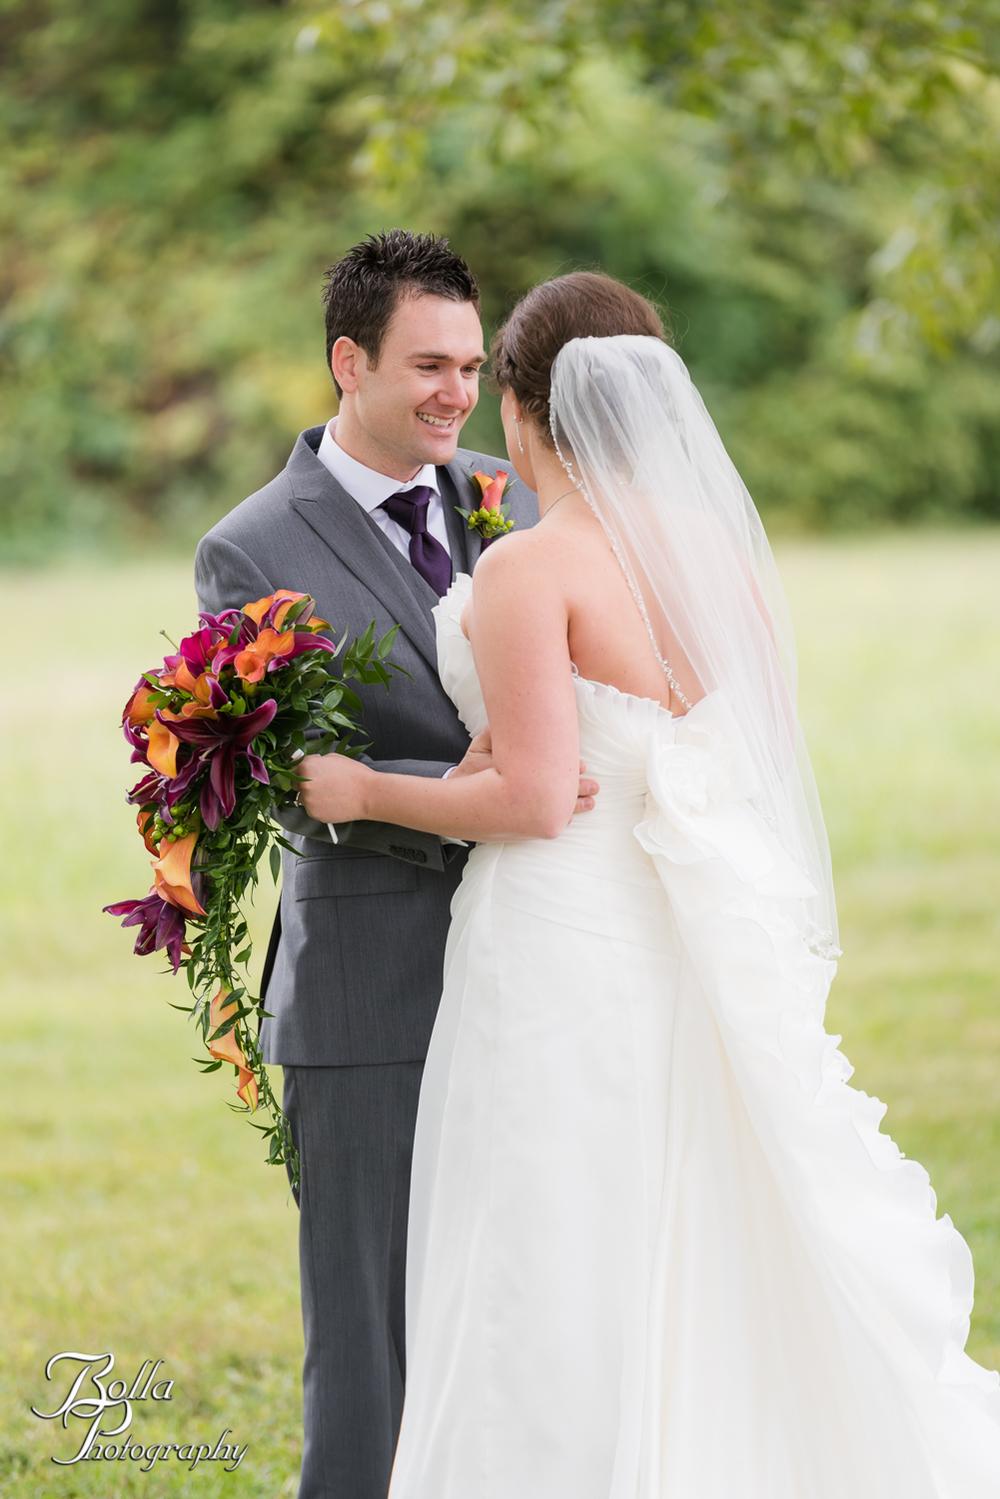 Bolla_Photography_St_Louis_wedding_photographer-0078.jpg